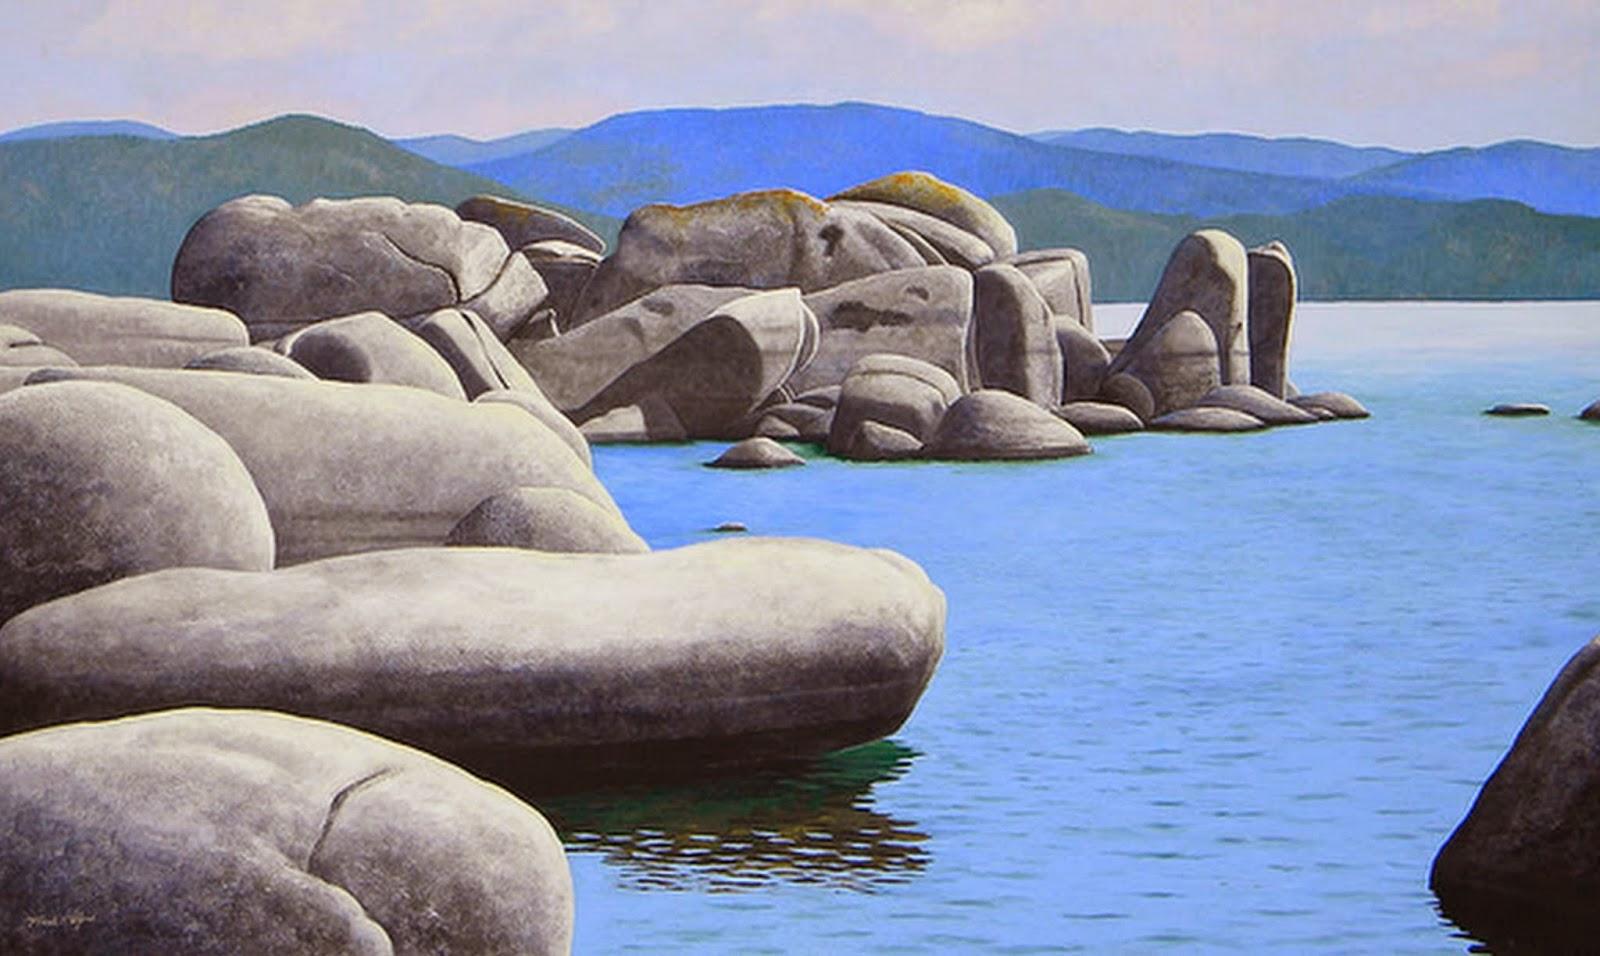 paisajes-realistas-naturales